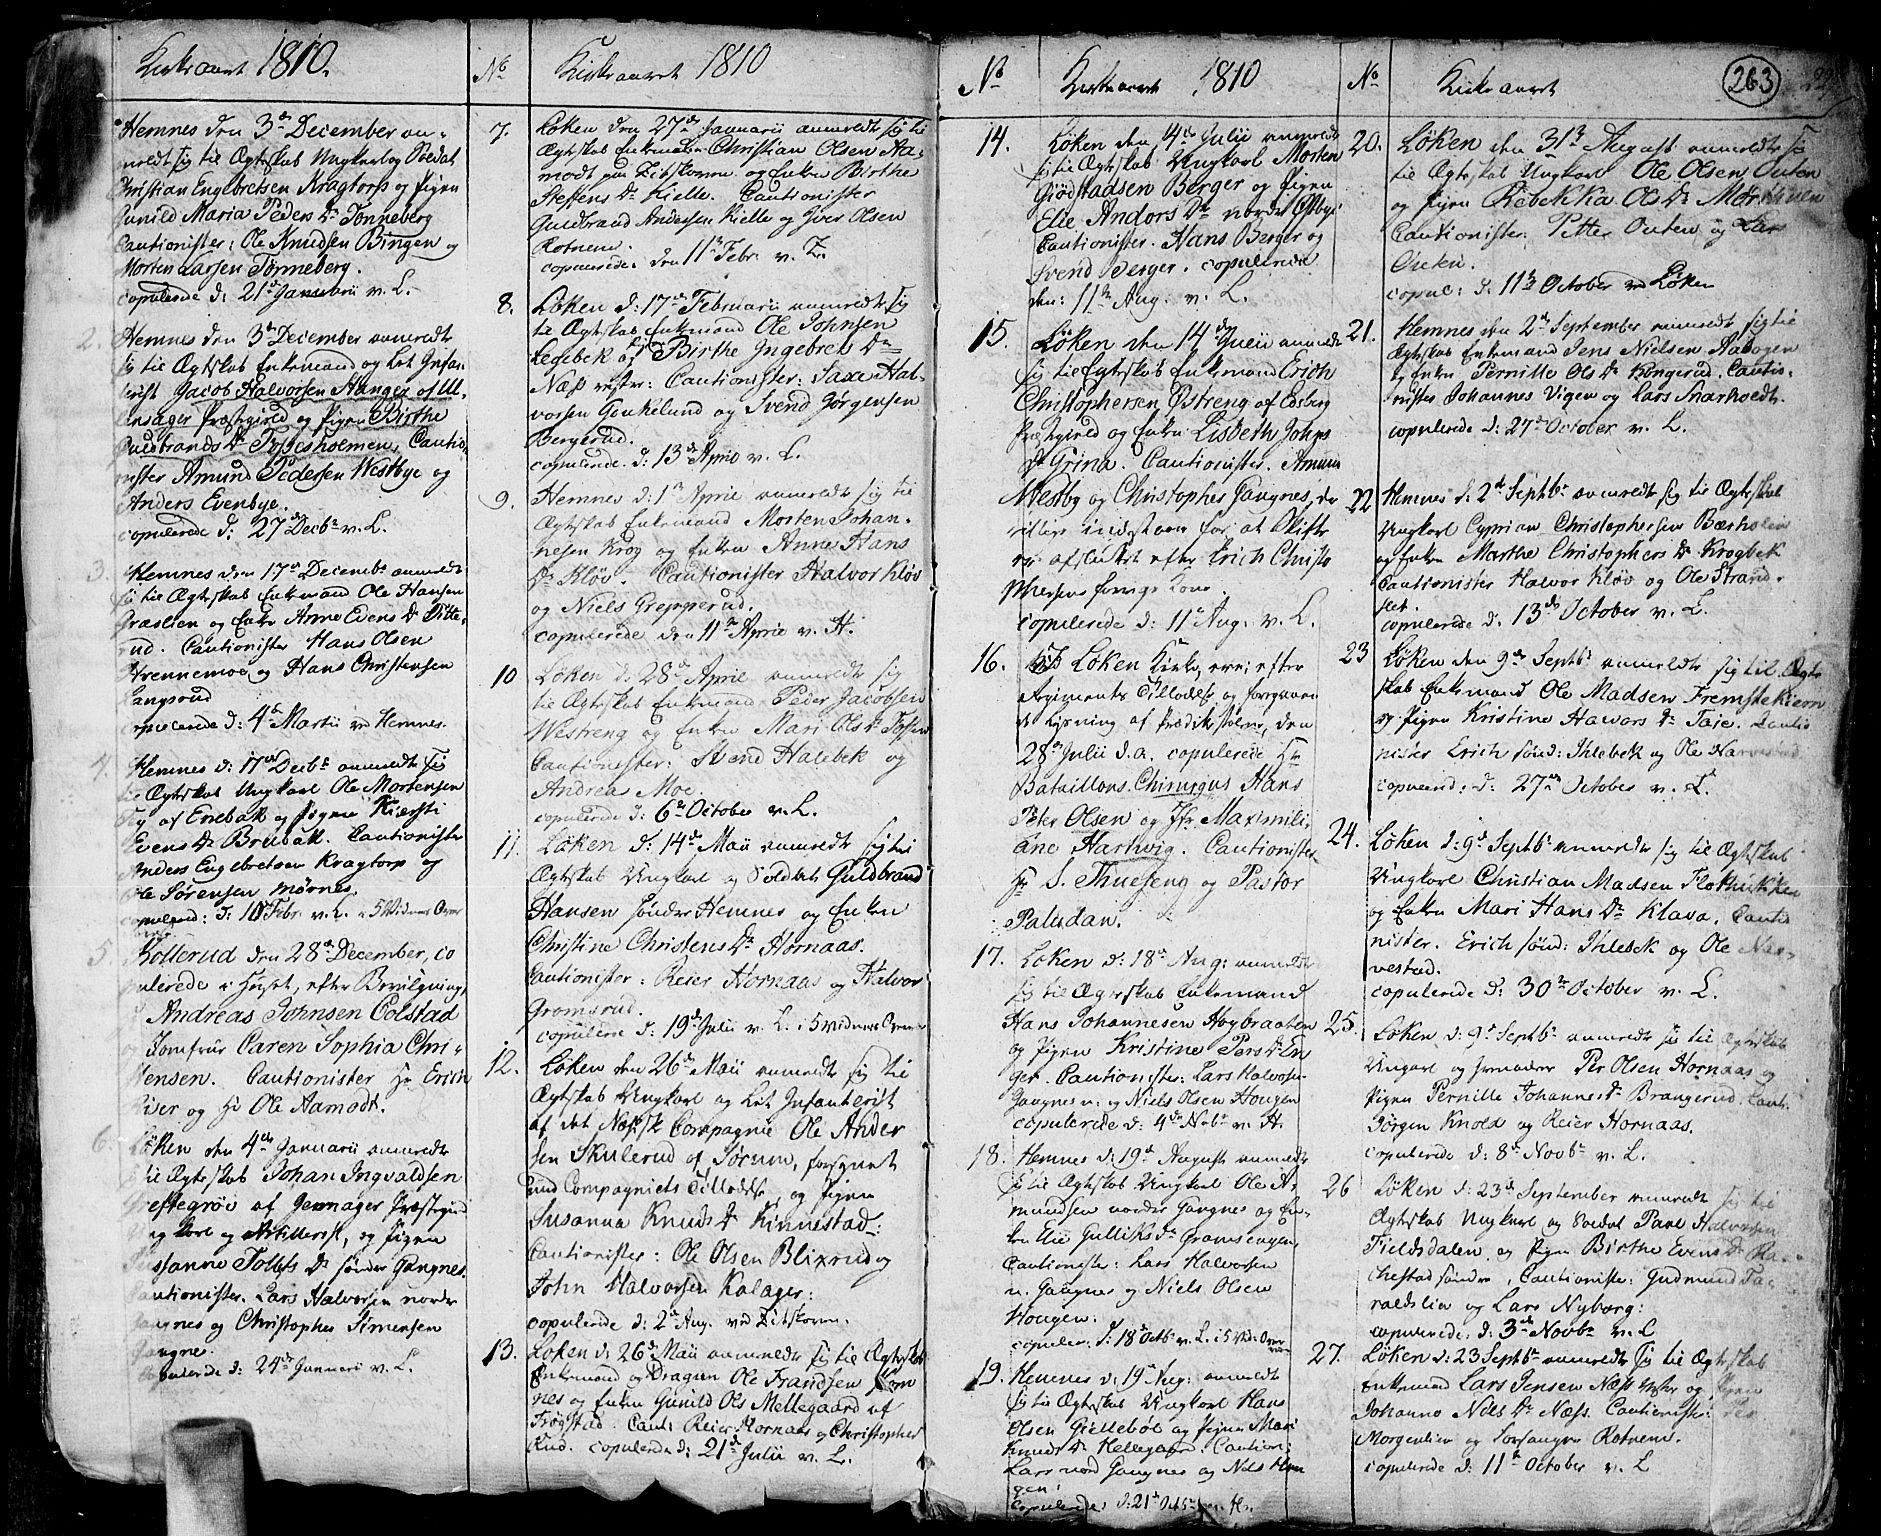 SAO, Høland prestekontor Kirkebøker, F/Fa/L0006: Ministerialbok nr. I 6, 1794-1814, s. 263